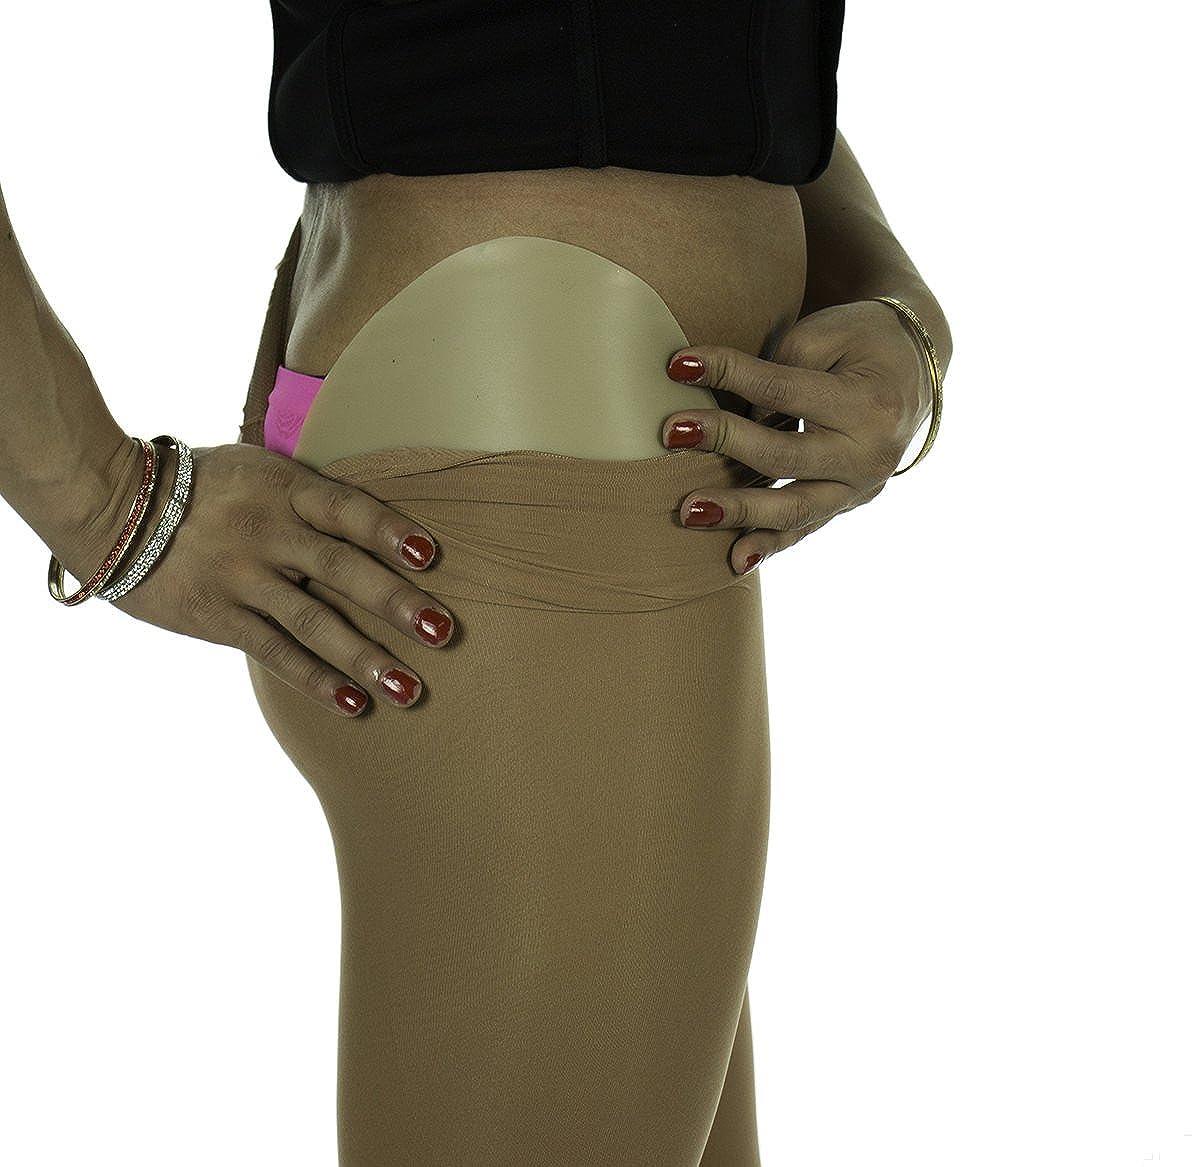 2a97a0750ca DressTech Crossdressing Hip Pads at Amazon Women s Clothing store